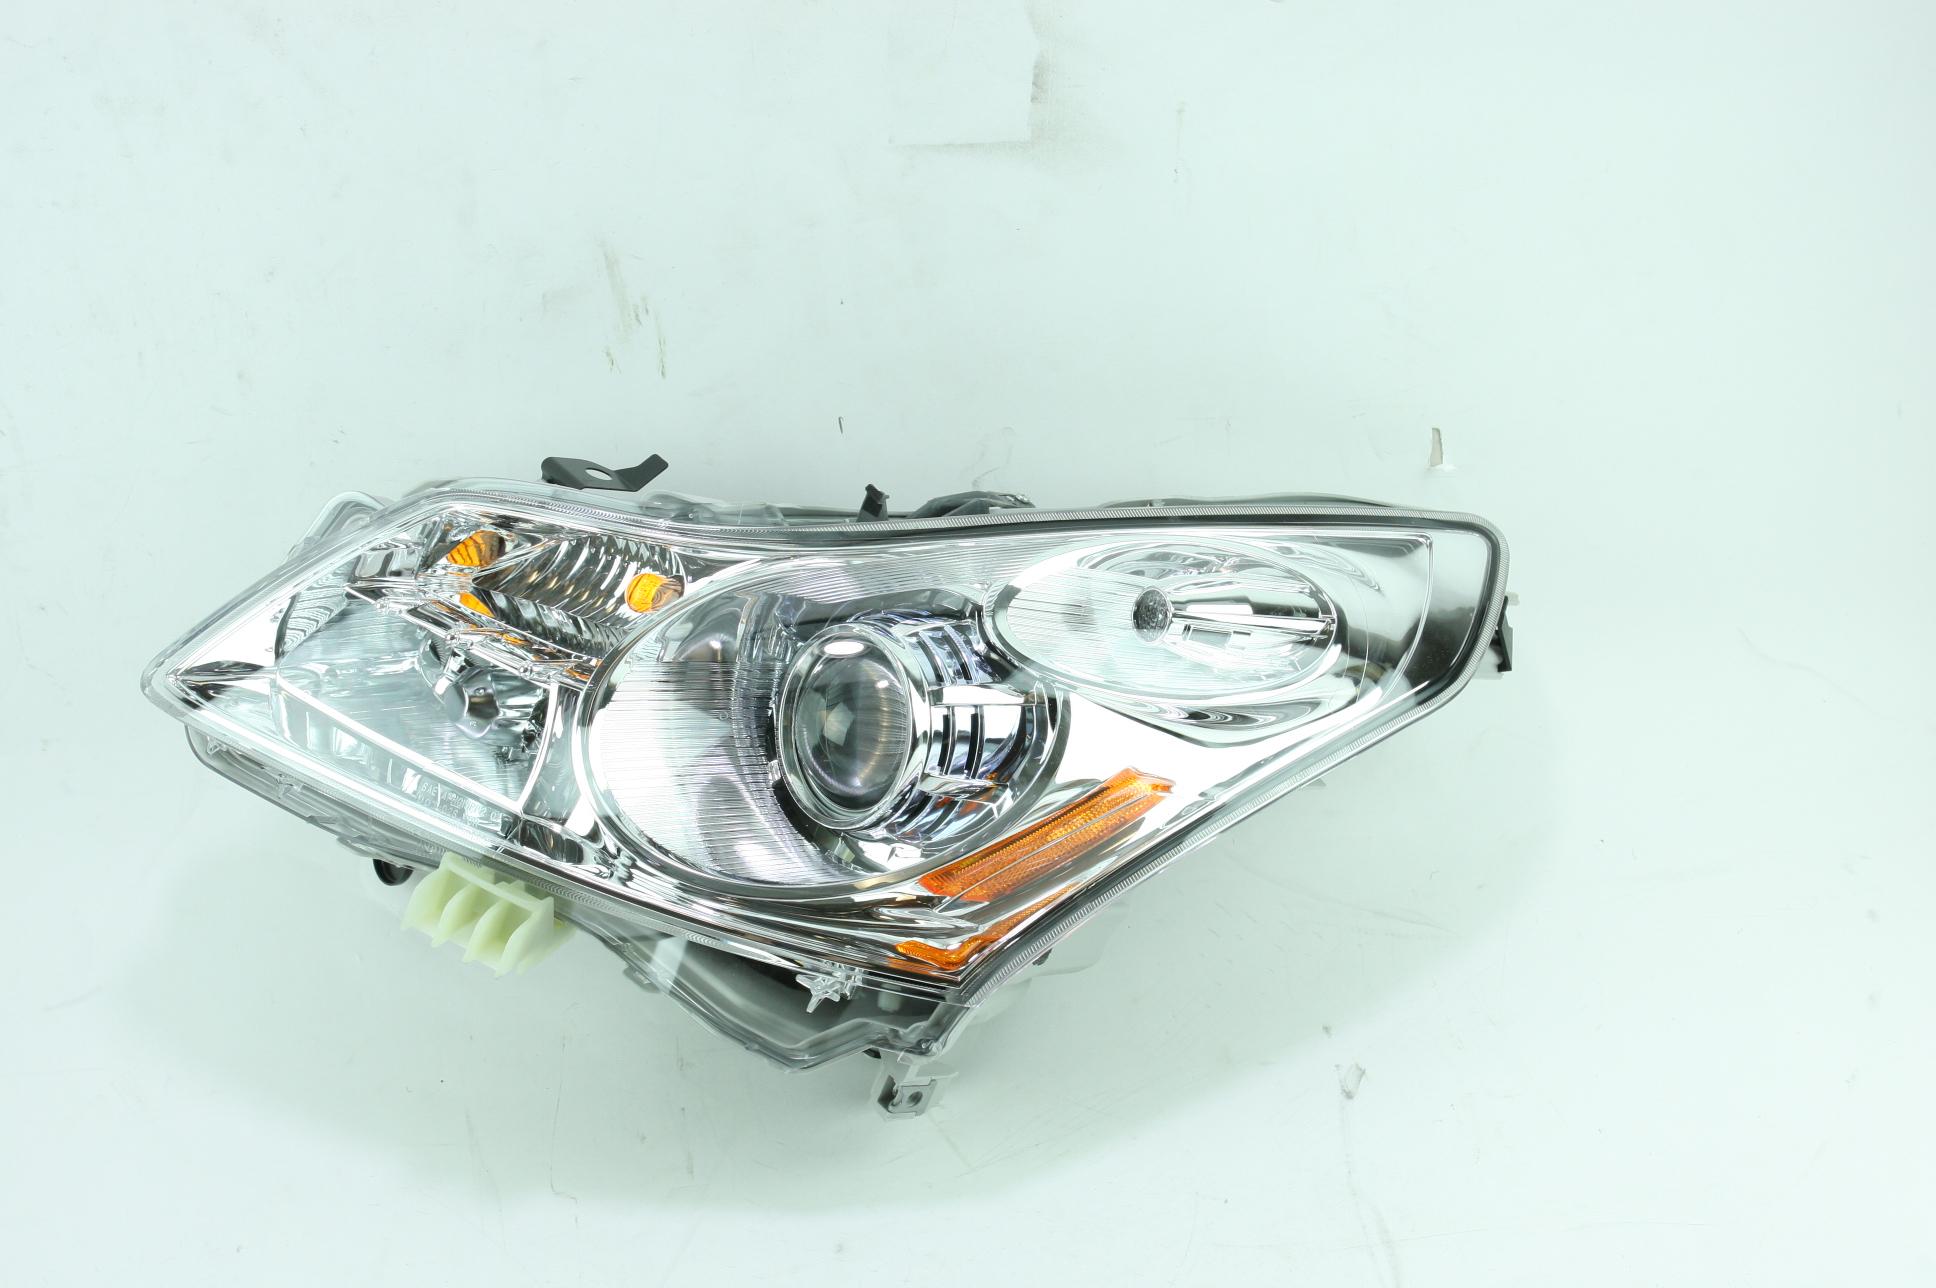 * Infiniti G37 Sedan Headlight LH Driver Side Genuine Nissan OEM 26060JK60E New - image 1